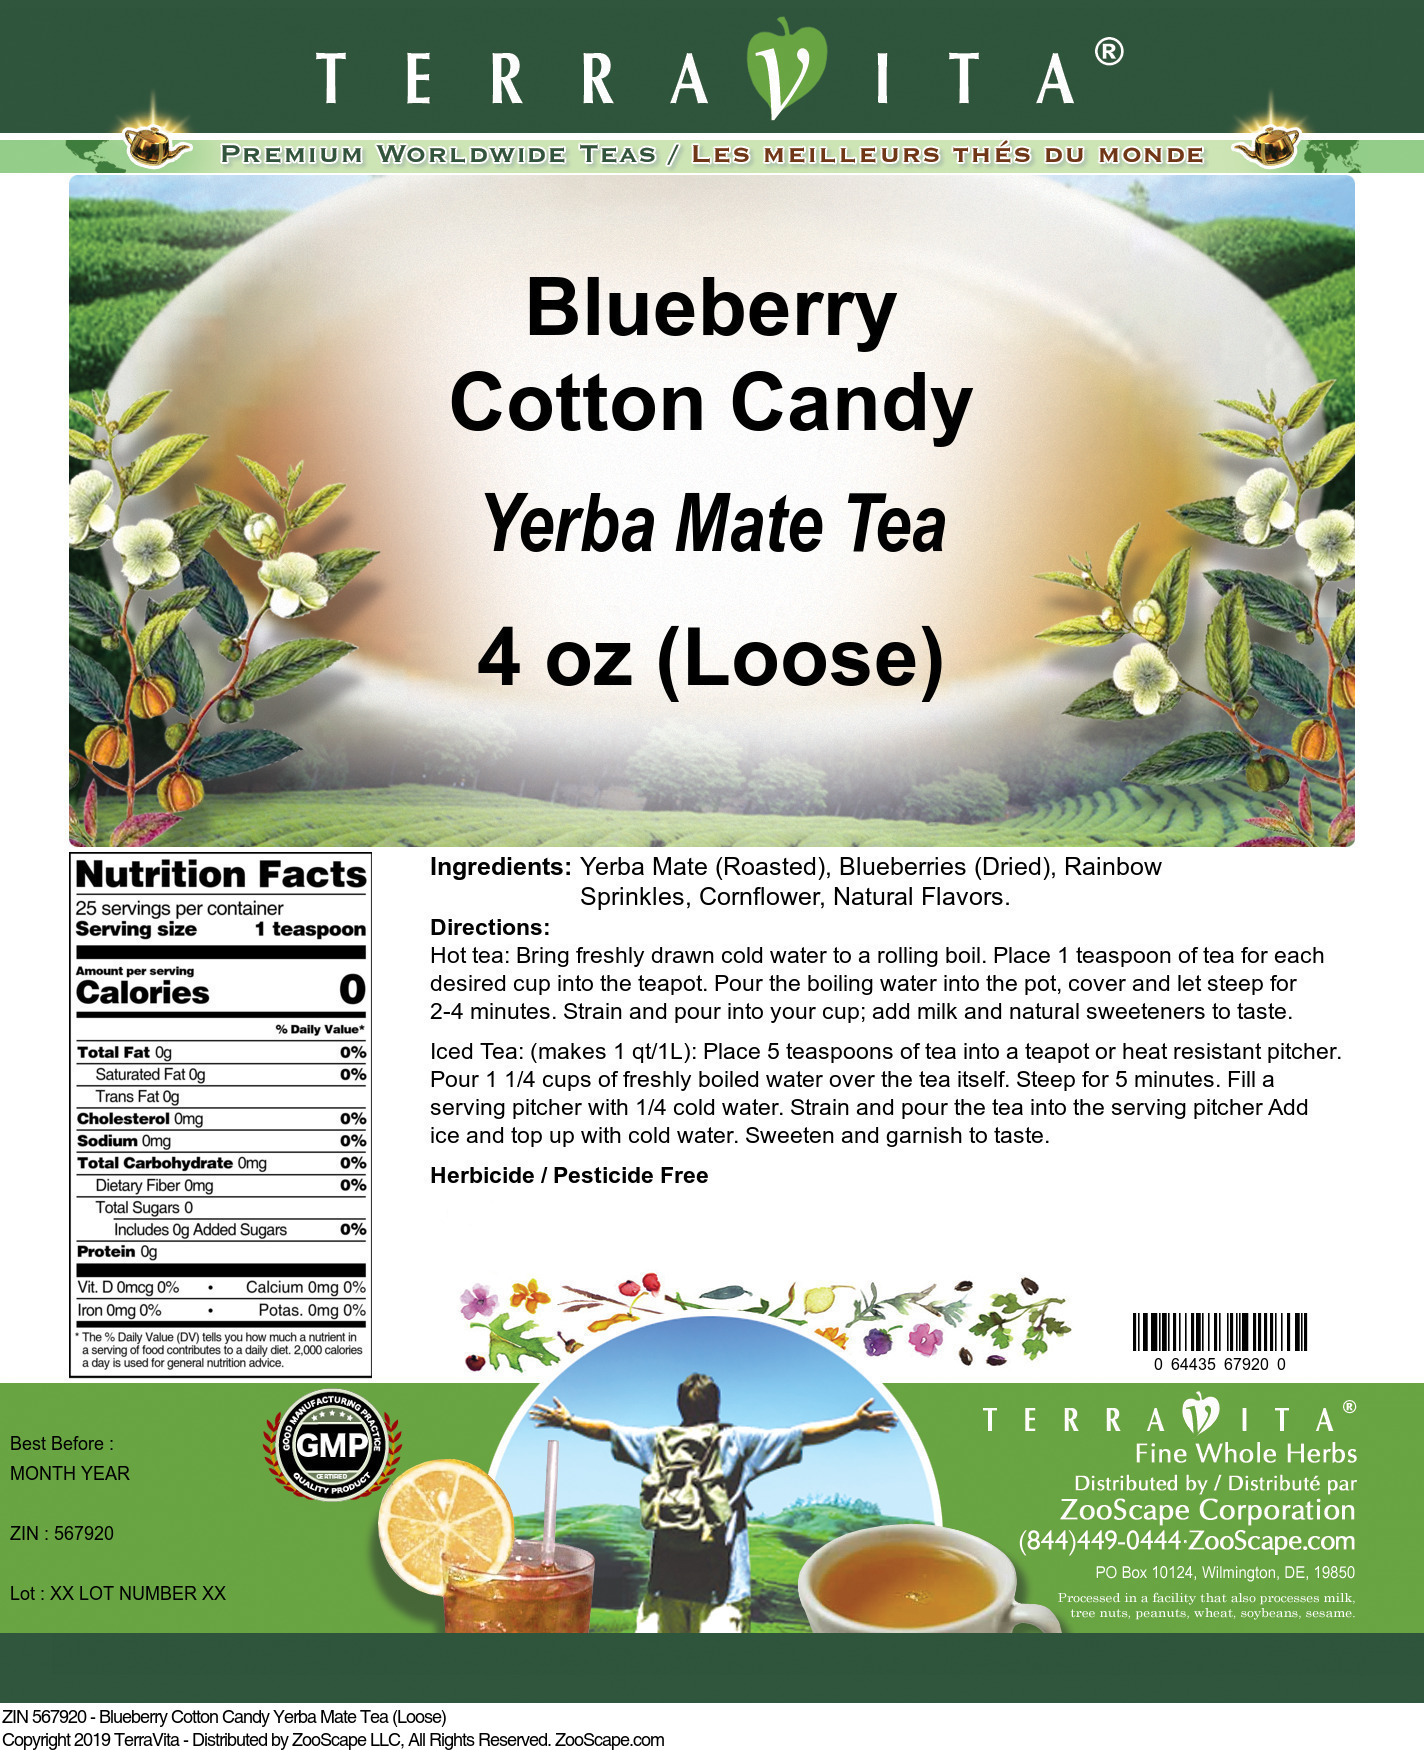 Blueberry Cotton Candy Yerba Mate Tea (Loose)